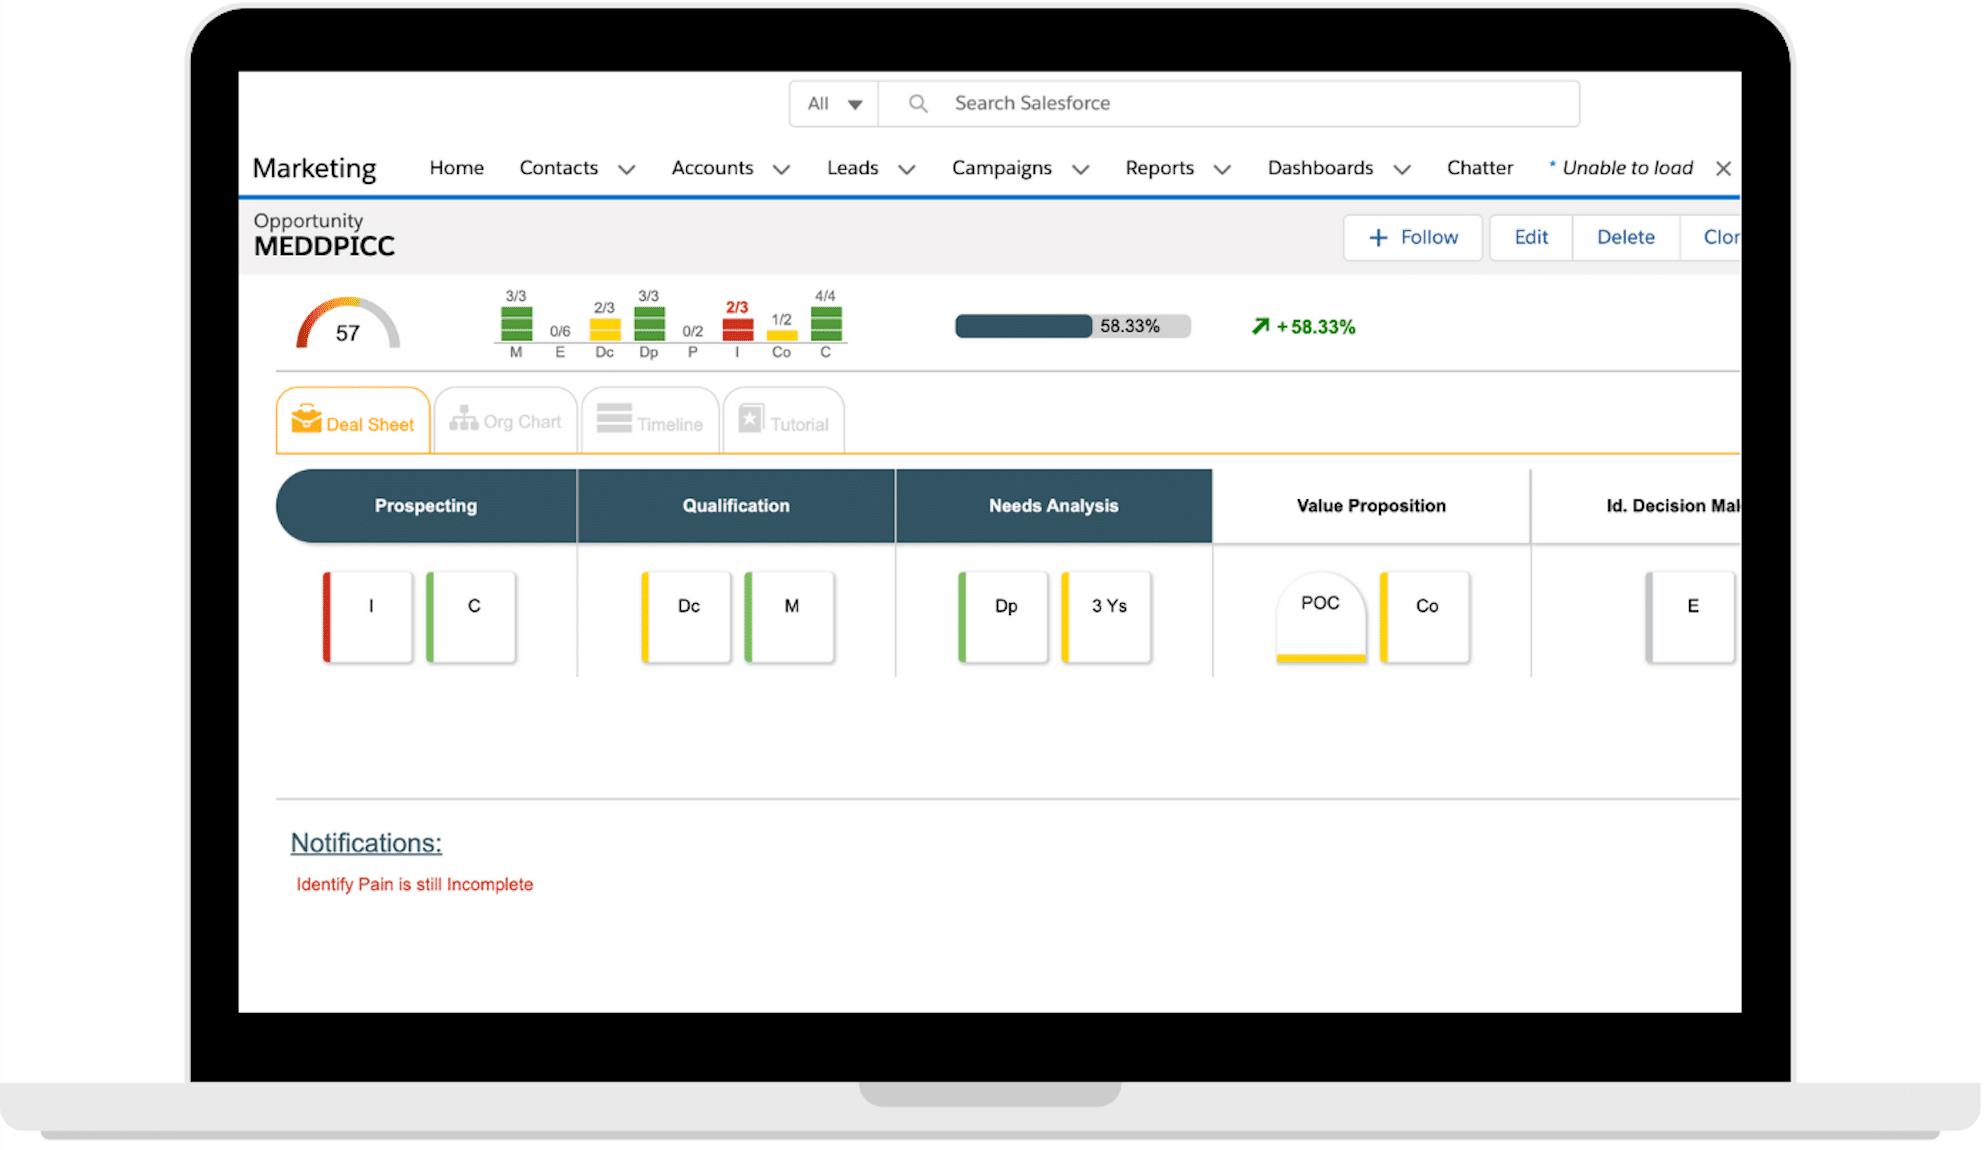 Visualize MEDDPICC on Salesforce